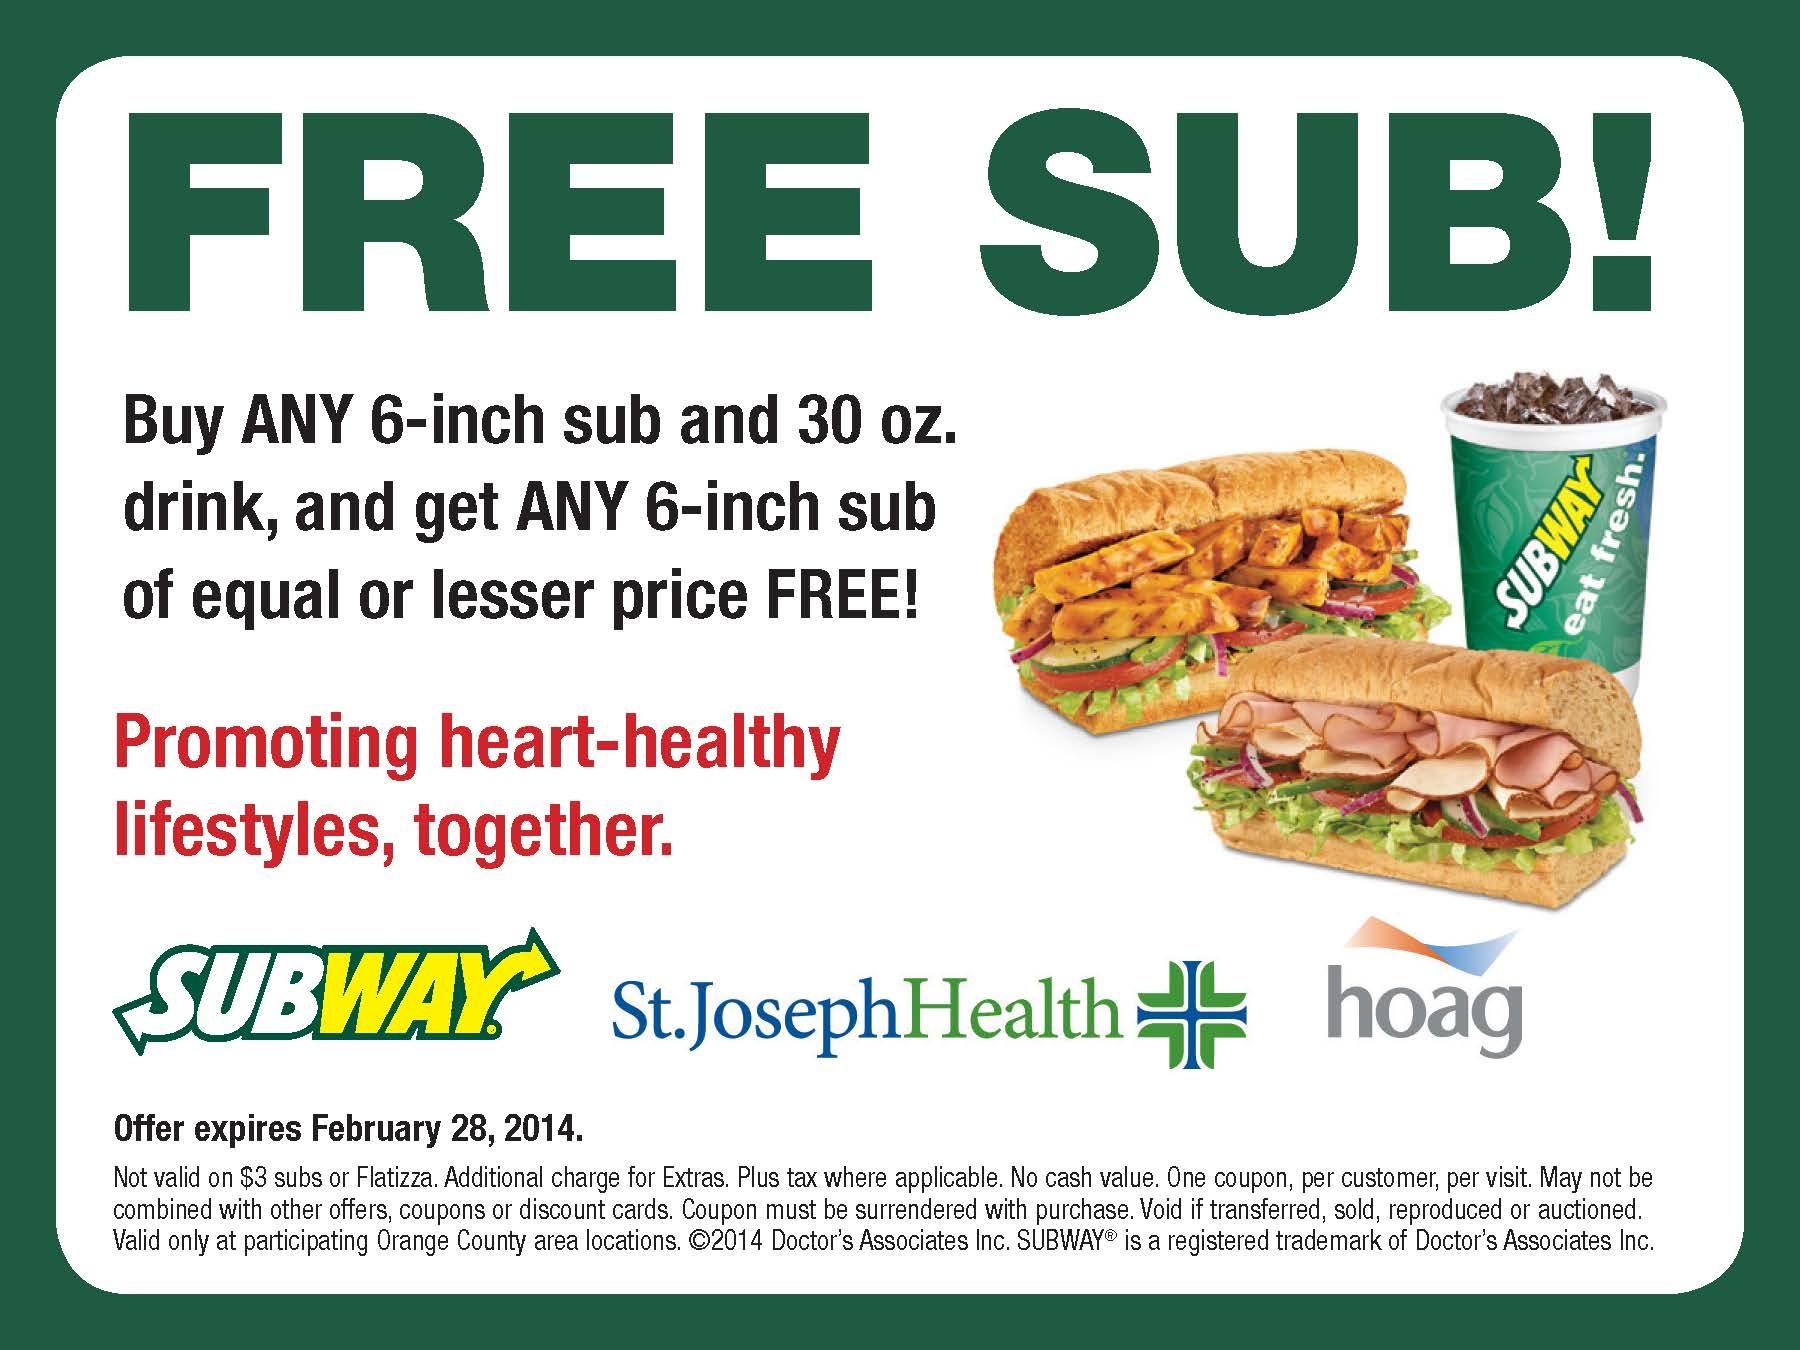 St. Joseph Hoag Subway Coupon – Printable Coupons Online - Free Printable Subway Coupons 2017